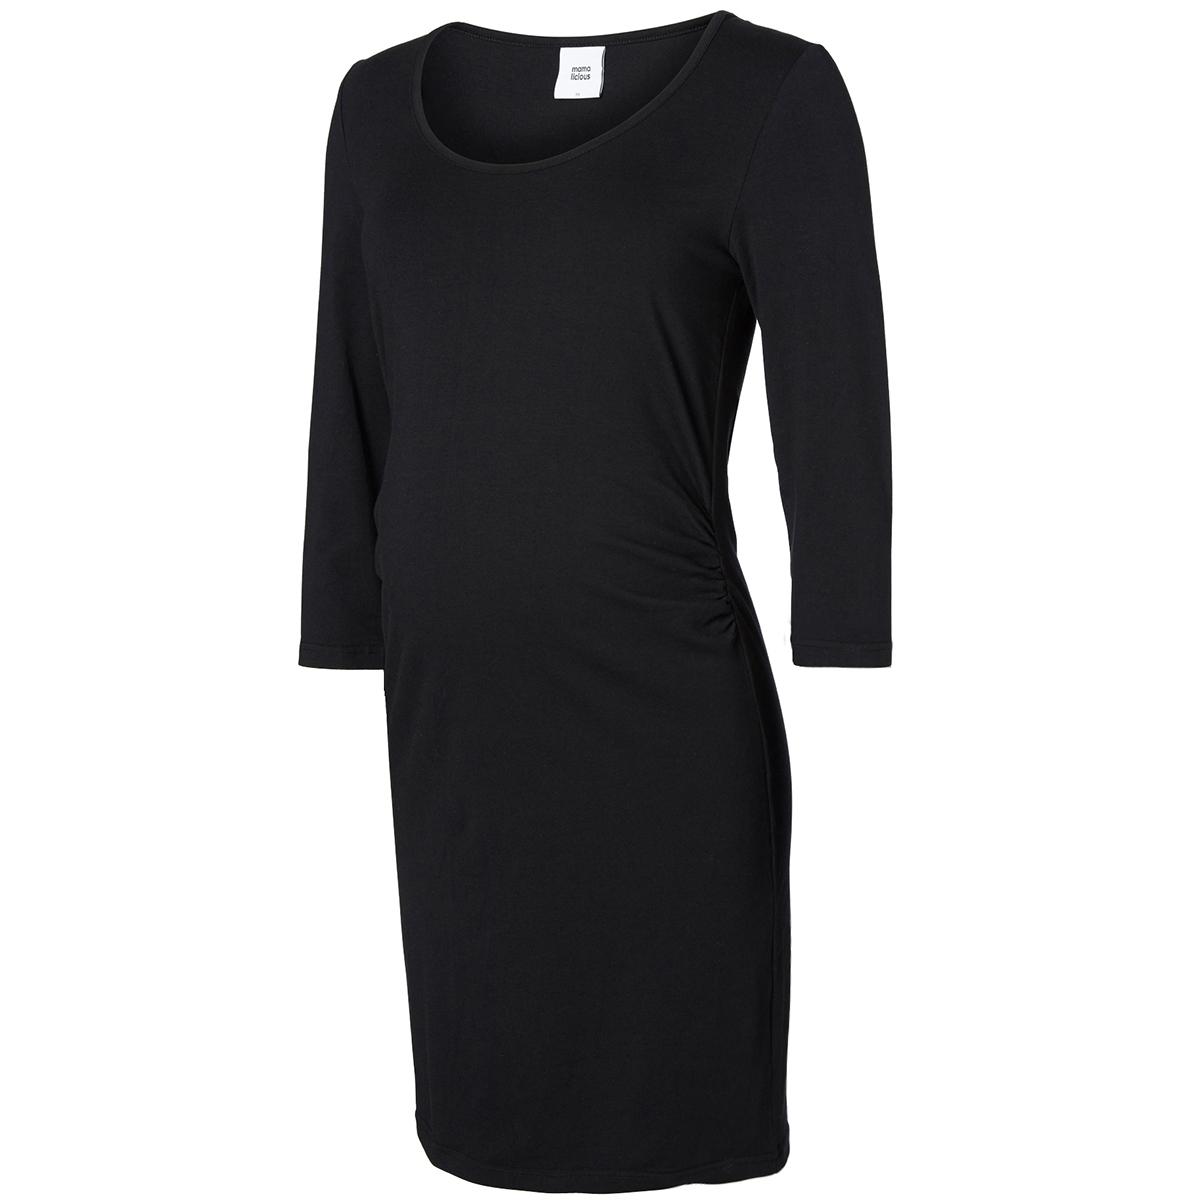 mllea organic 3/4 dress 20007240 mama-licious positie jurk black